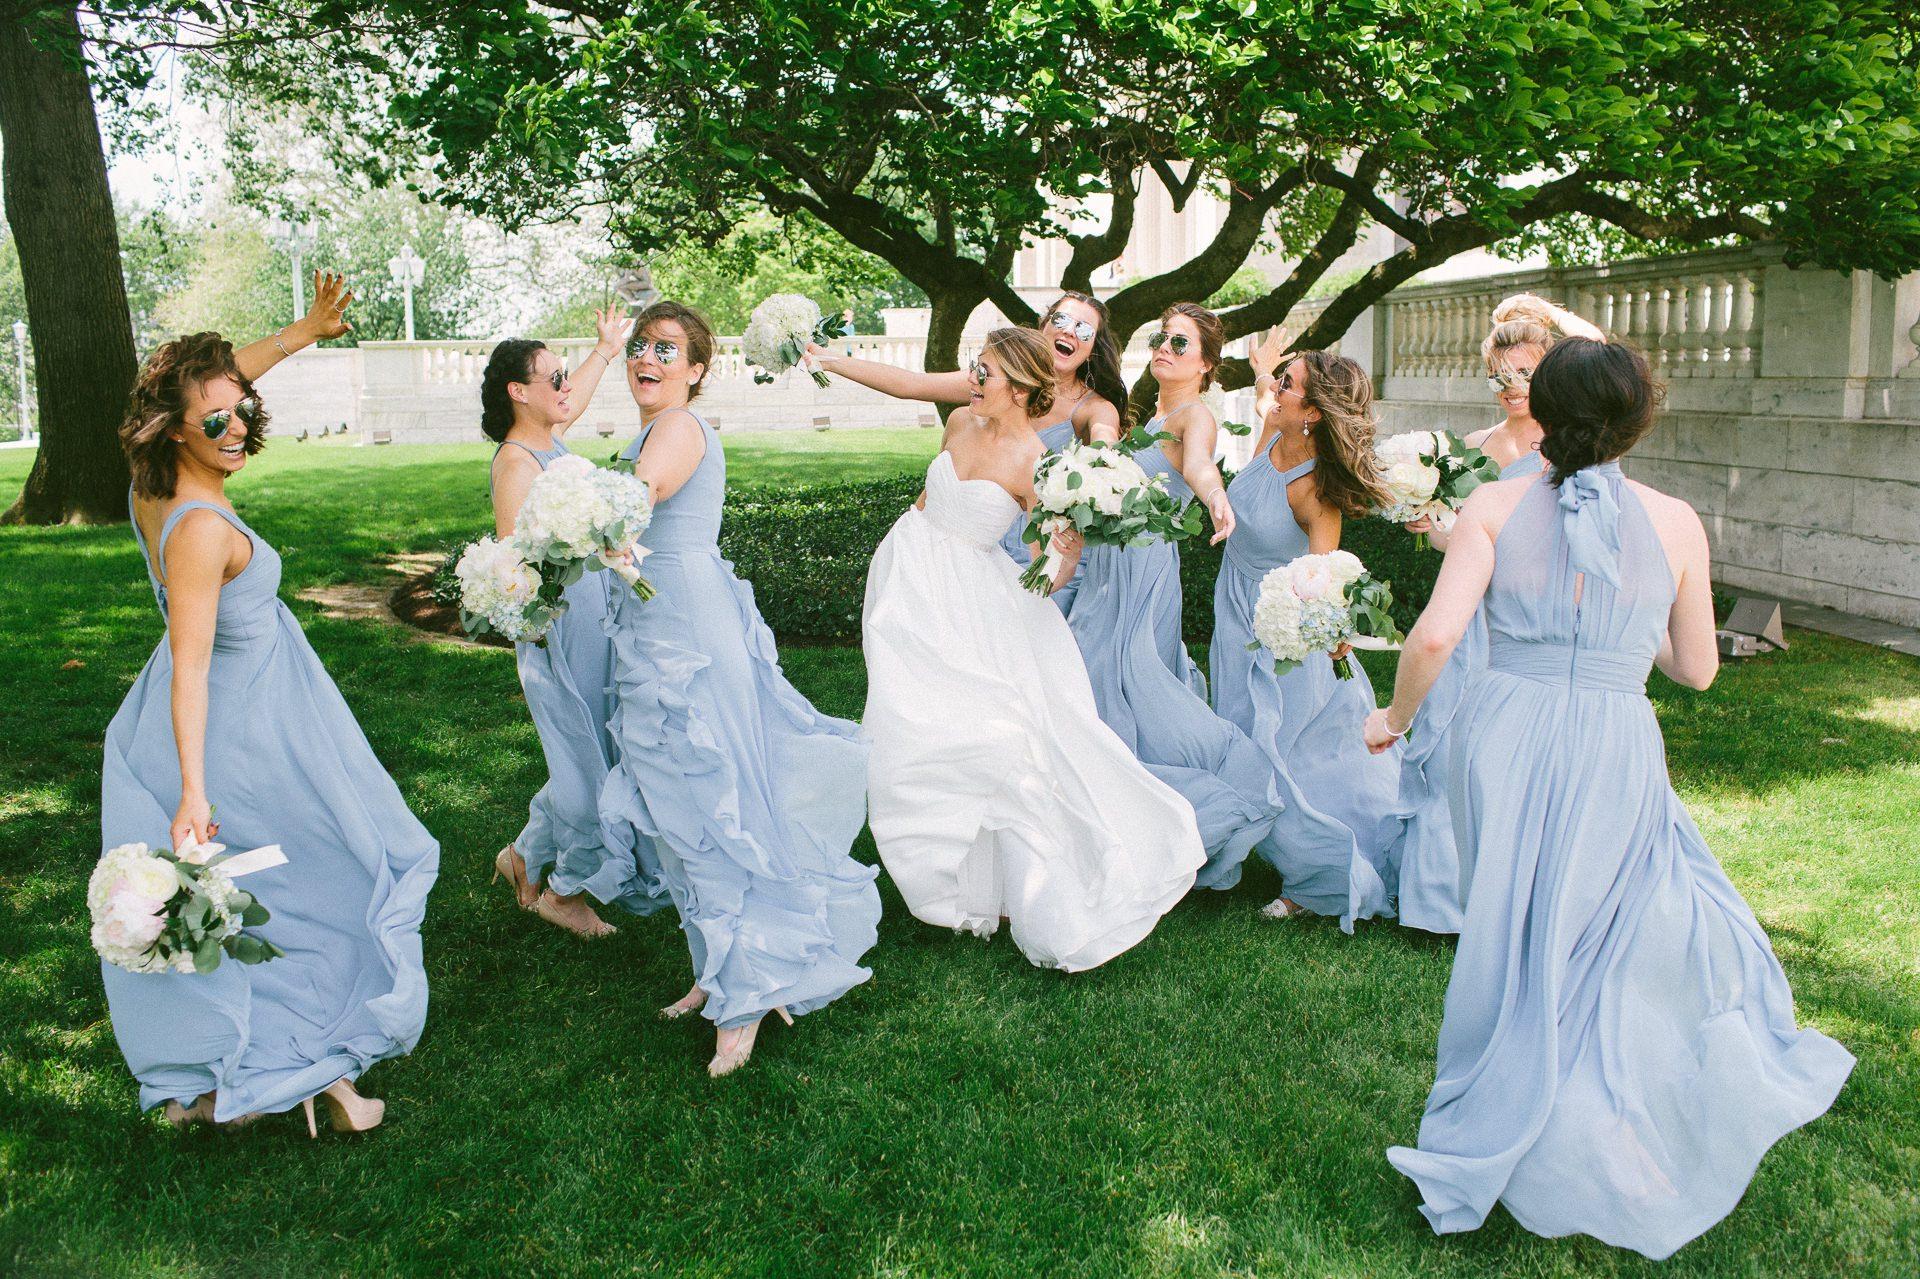 Dowtown Hilton Cleveland Wedding Photographer 1 38.jpg